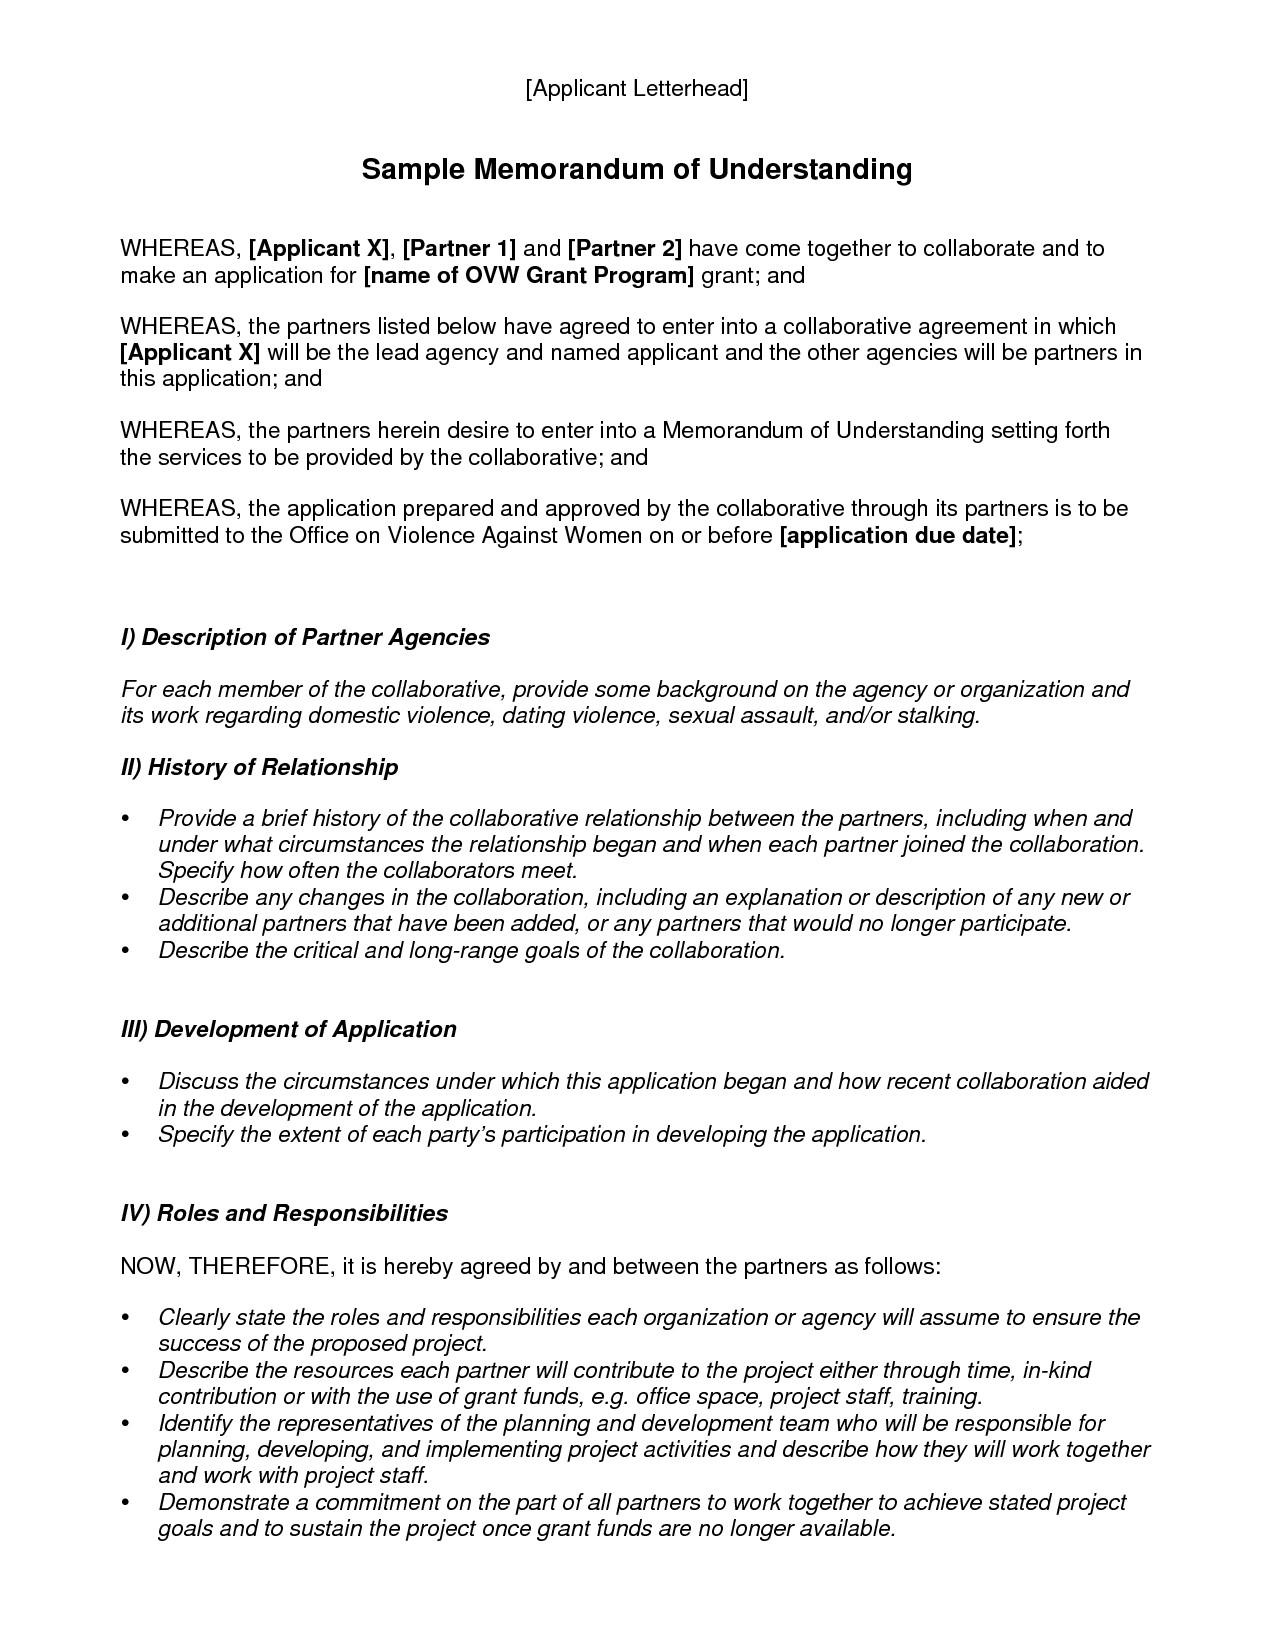 Memorandum Of Understanding Sample Memorandum Understanding Template